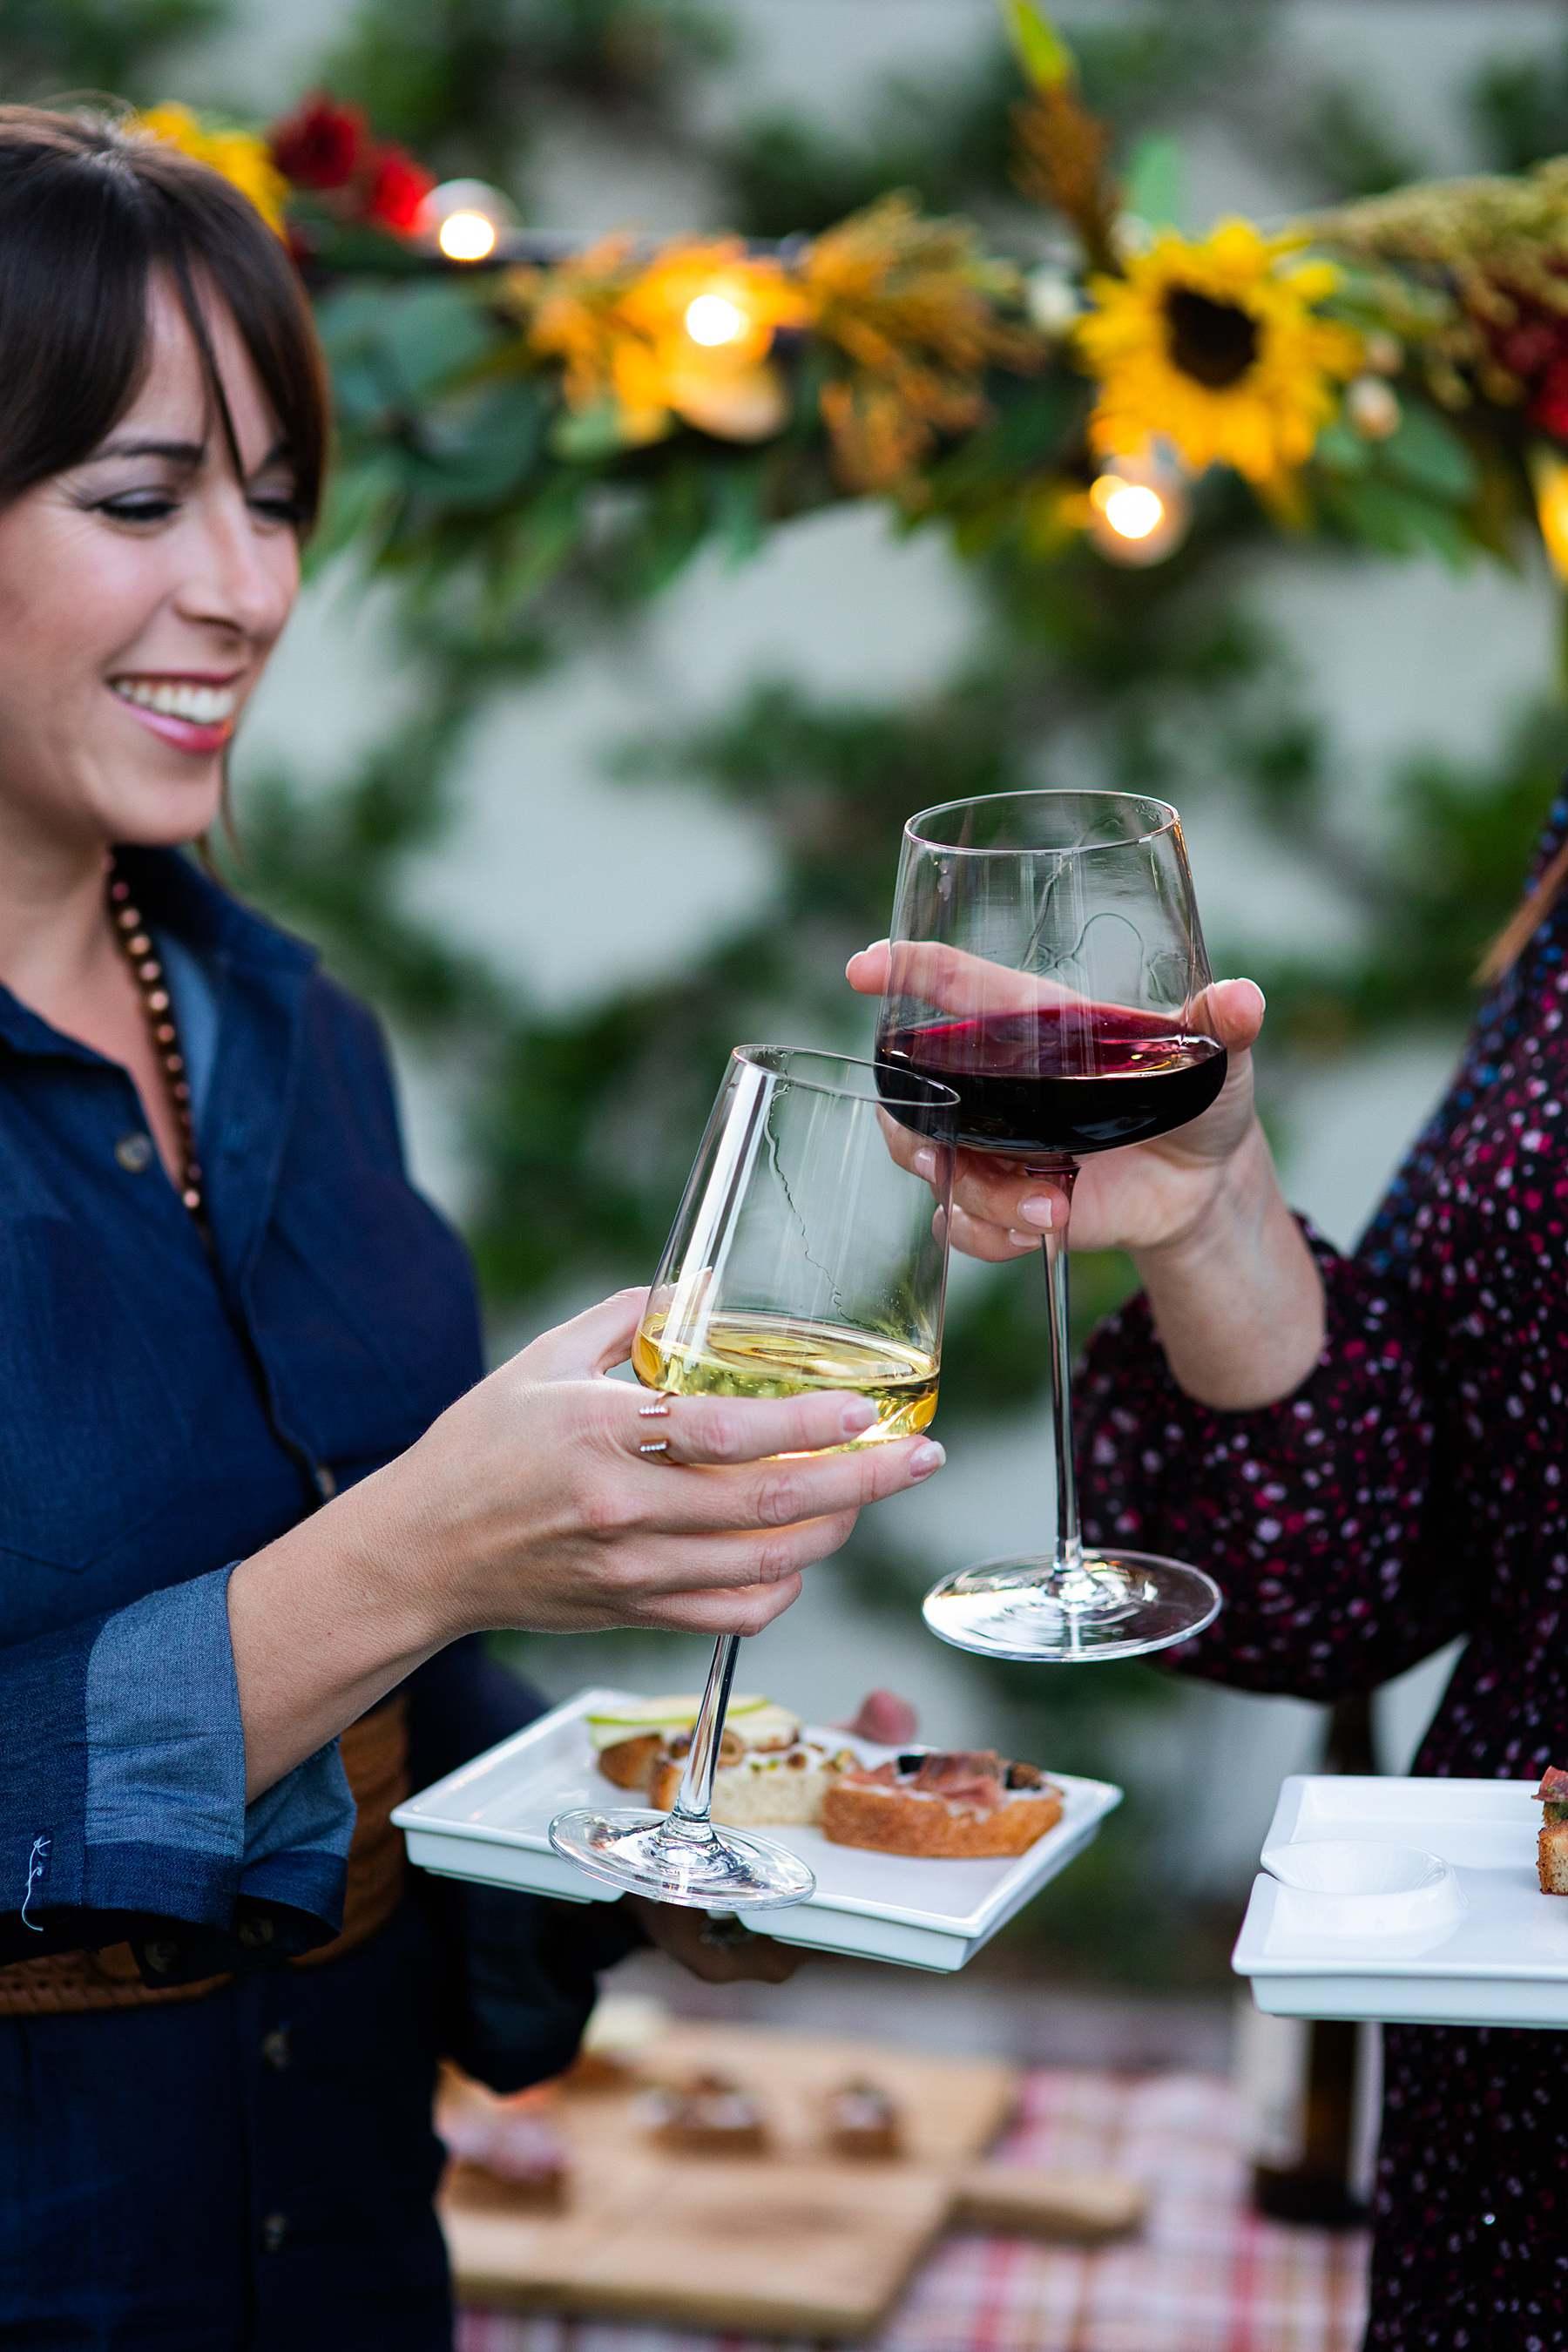 decoy wine night party Friendsgiving outdoor party catch up - Diana Elizabeth blog phoenix lifestyle entertaining hostess blogger